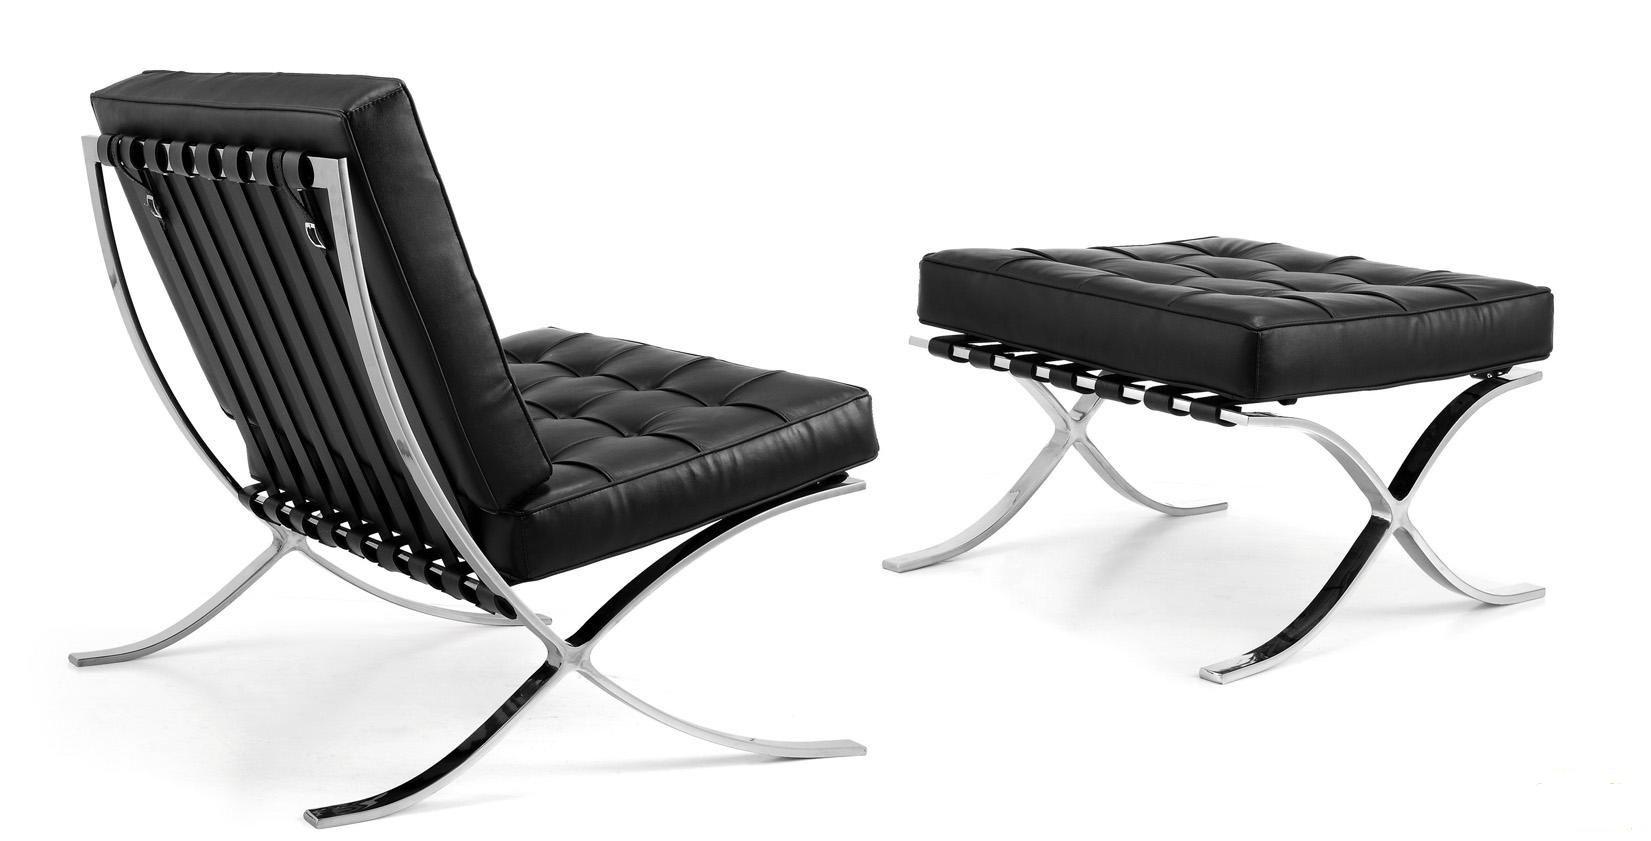 Barcelona chair back -